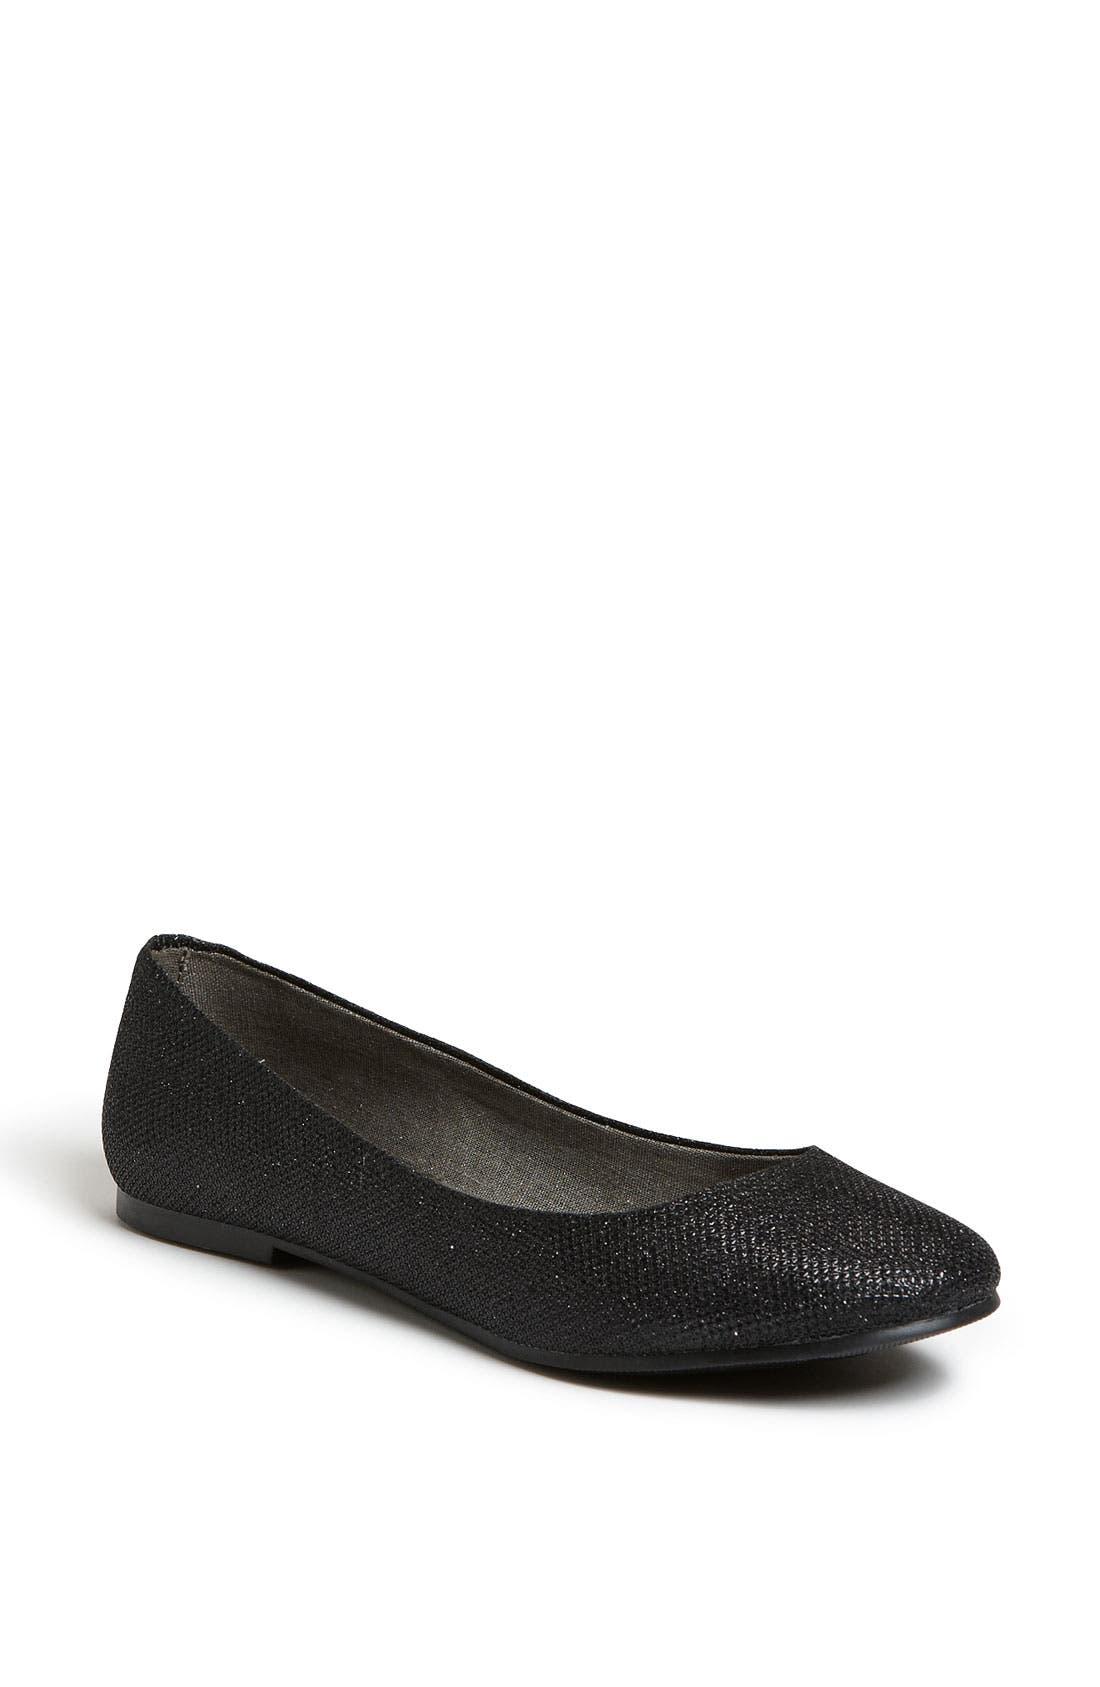 Alternate Image 1 Selected - BC Footwear 'Limousine' Mesh Flat